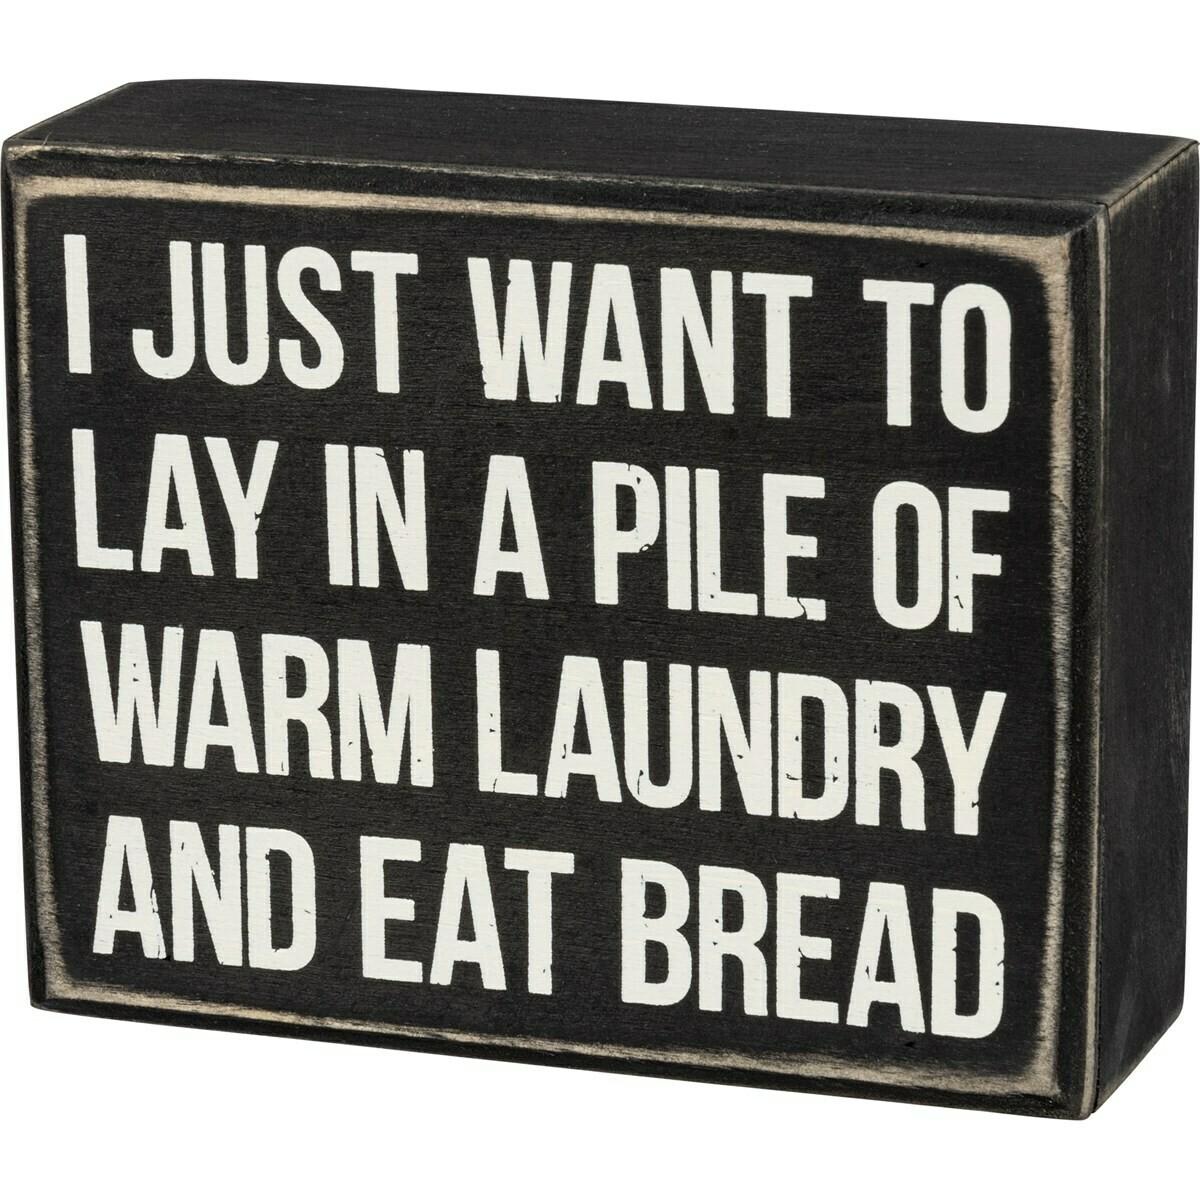 Warm Laundry Box Sign